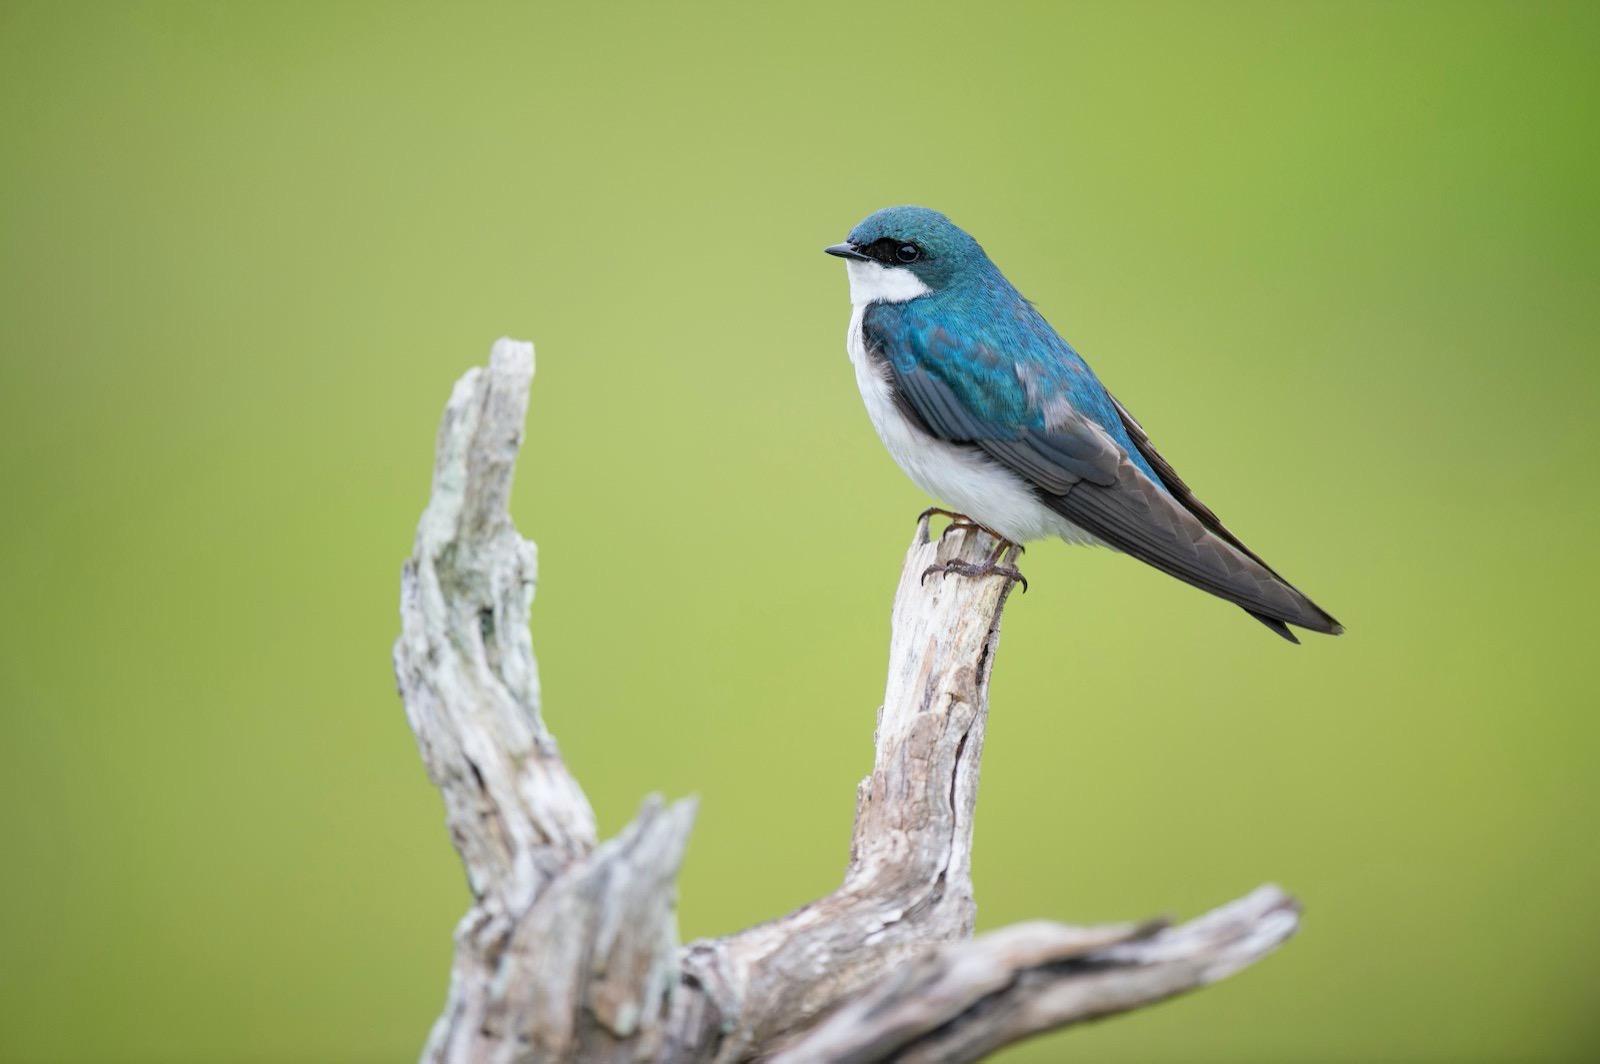 Ray hennessy FStJWCVFjS4 unsplash bird